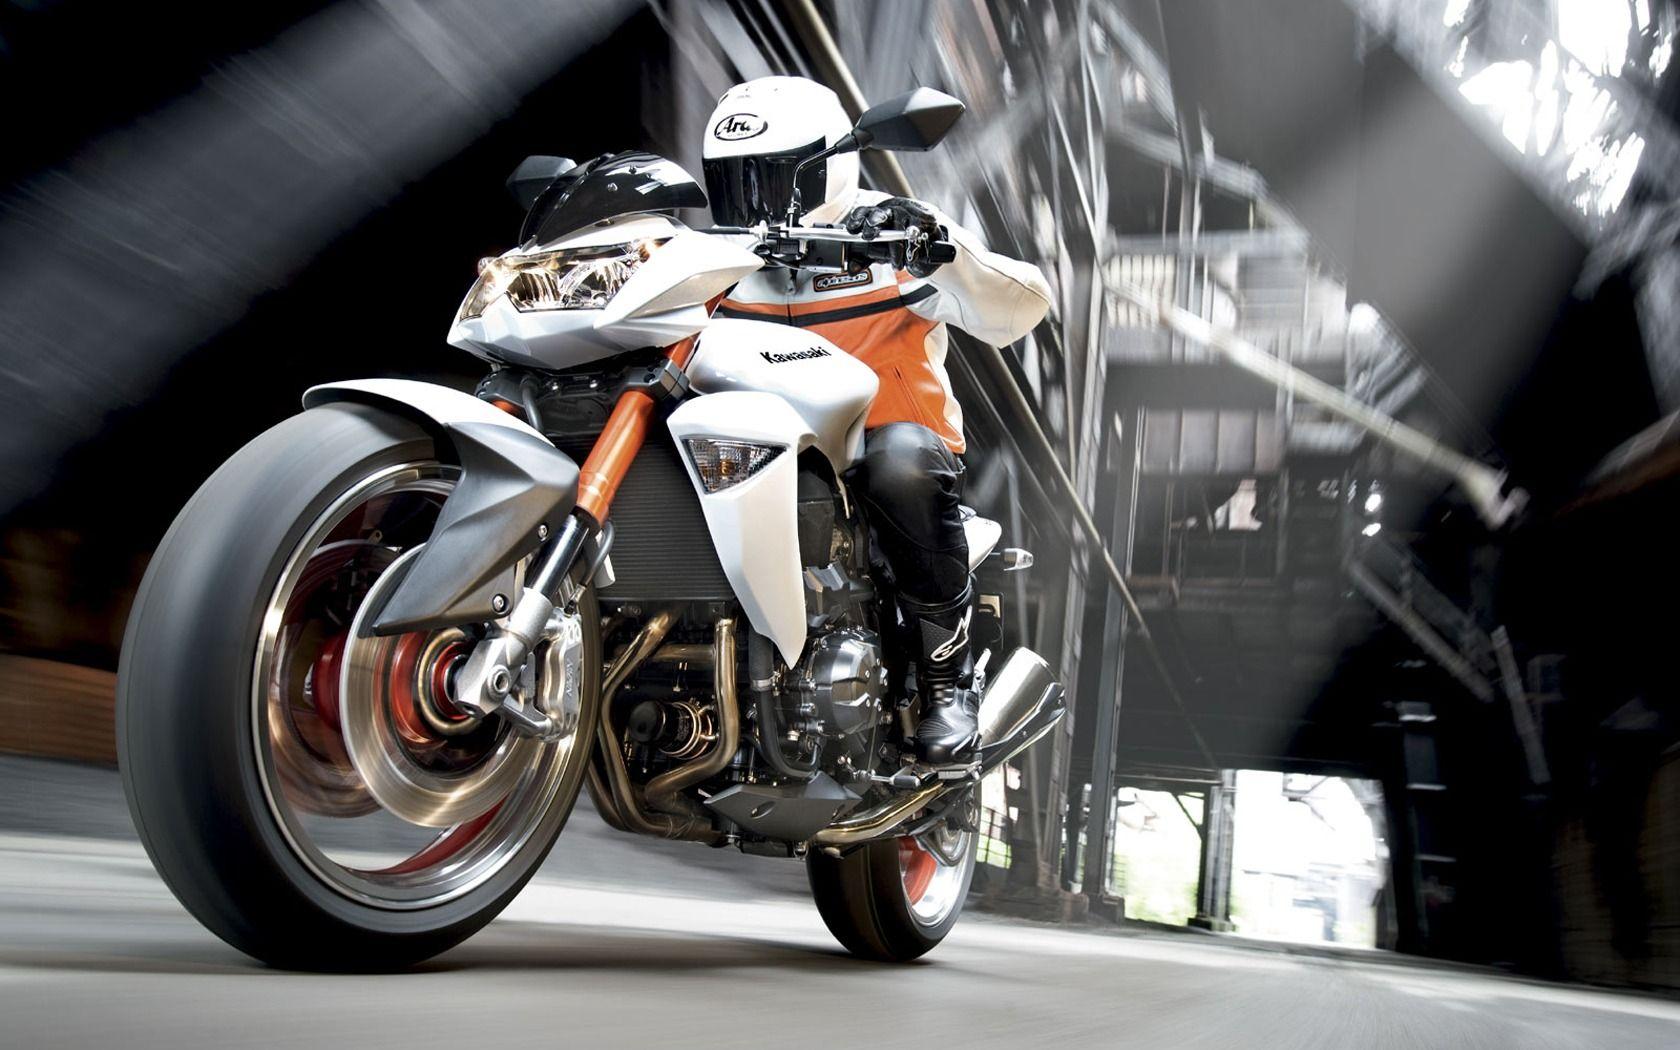 ca200af6e2f1 Kawasaki Z1000-1680-1050 HD Widescreen Wallpapers